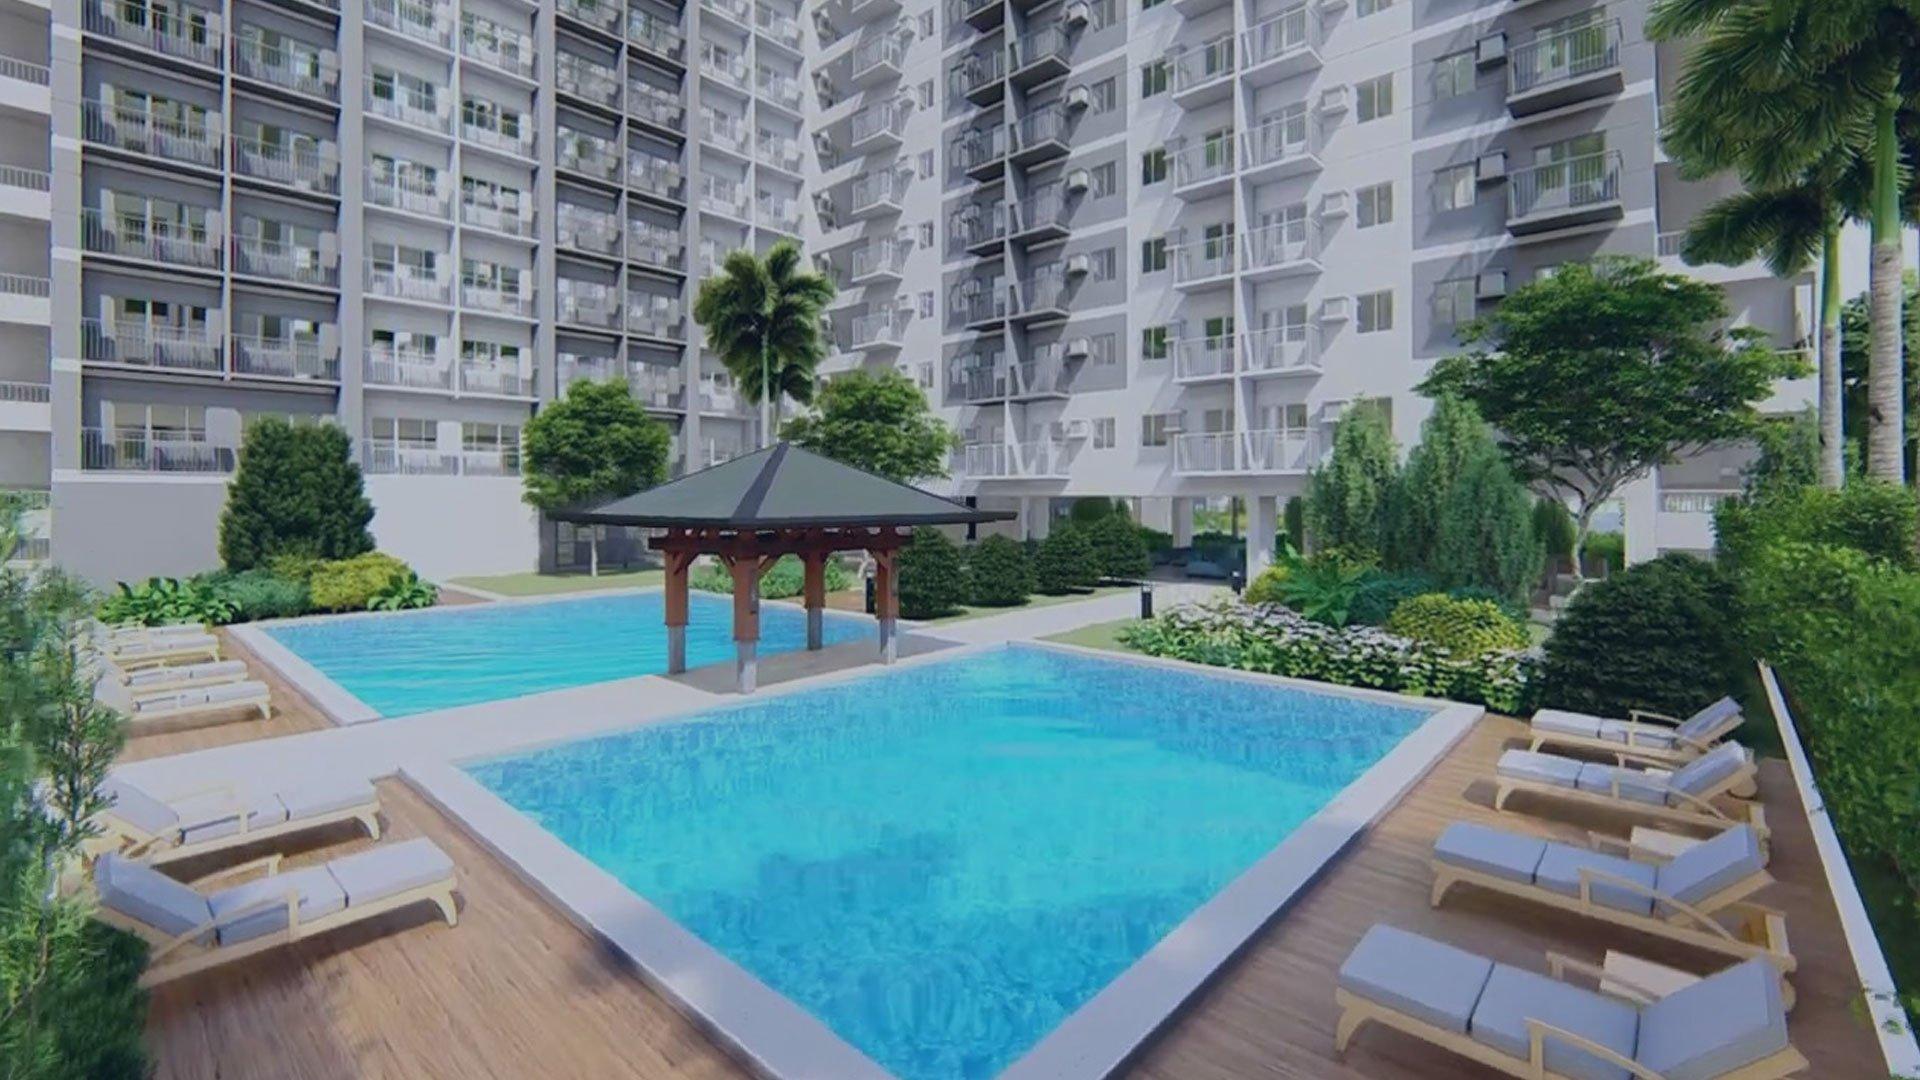 Style Residences Iloilo City